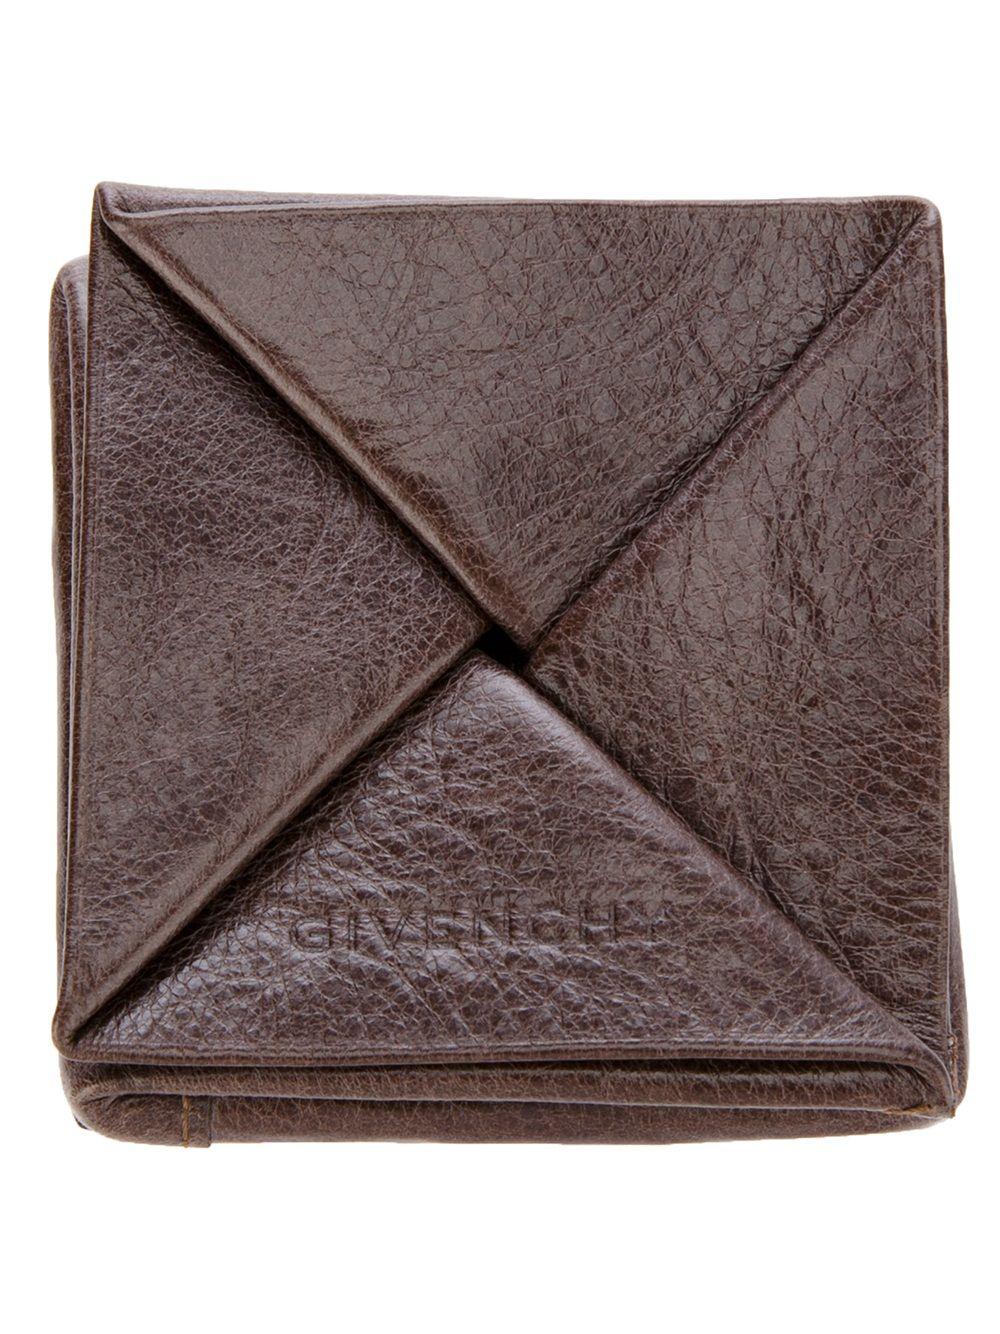 Flower Pattern Brown Leather Triangular Coin Purse Handmade In UK Wallet